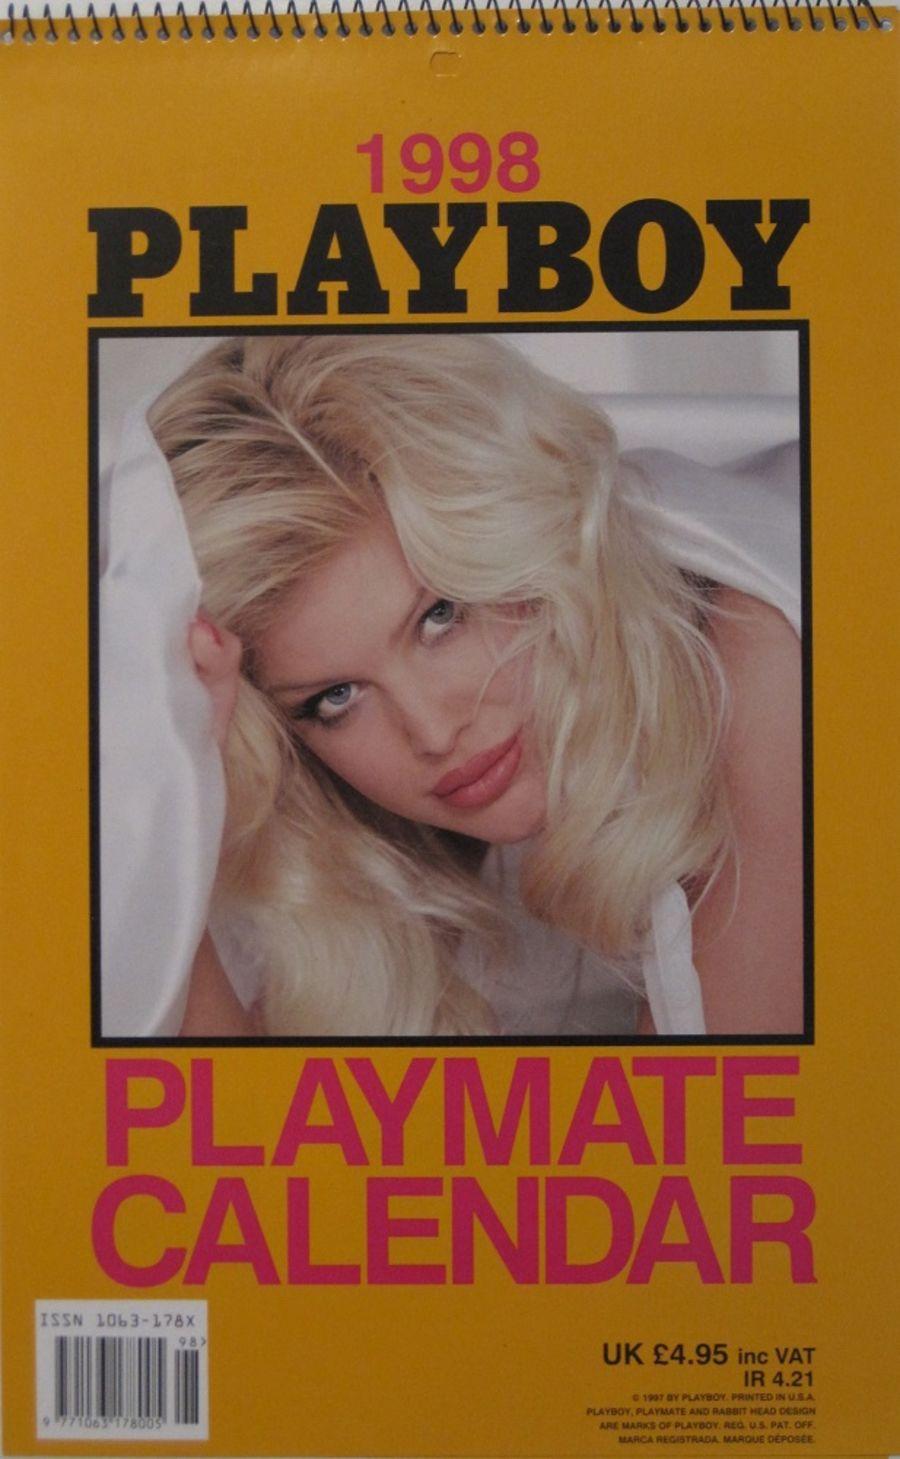 PLAYBOY PLAYMATE CALENDAR. 1998.